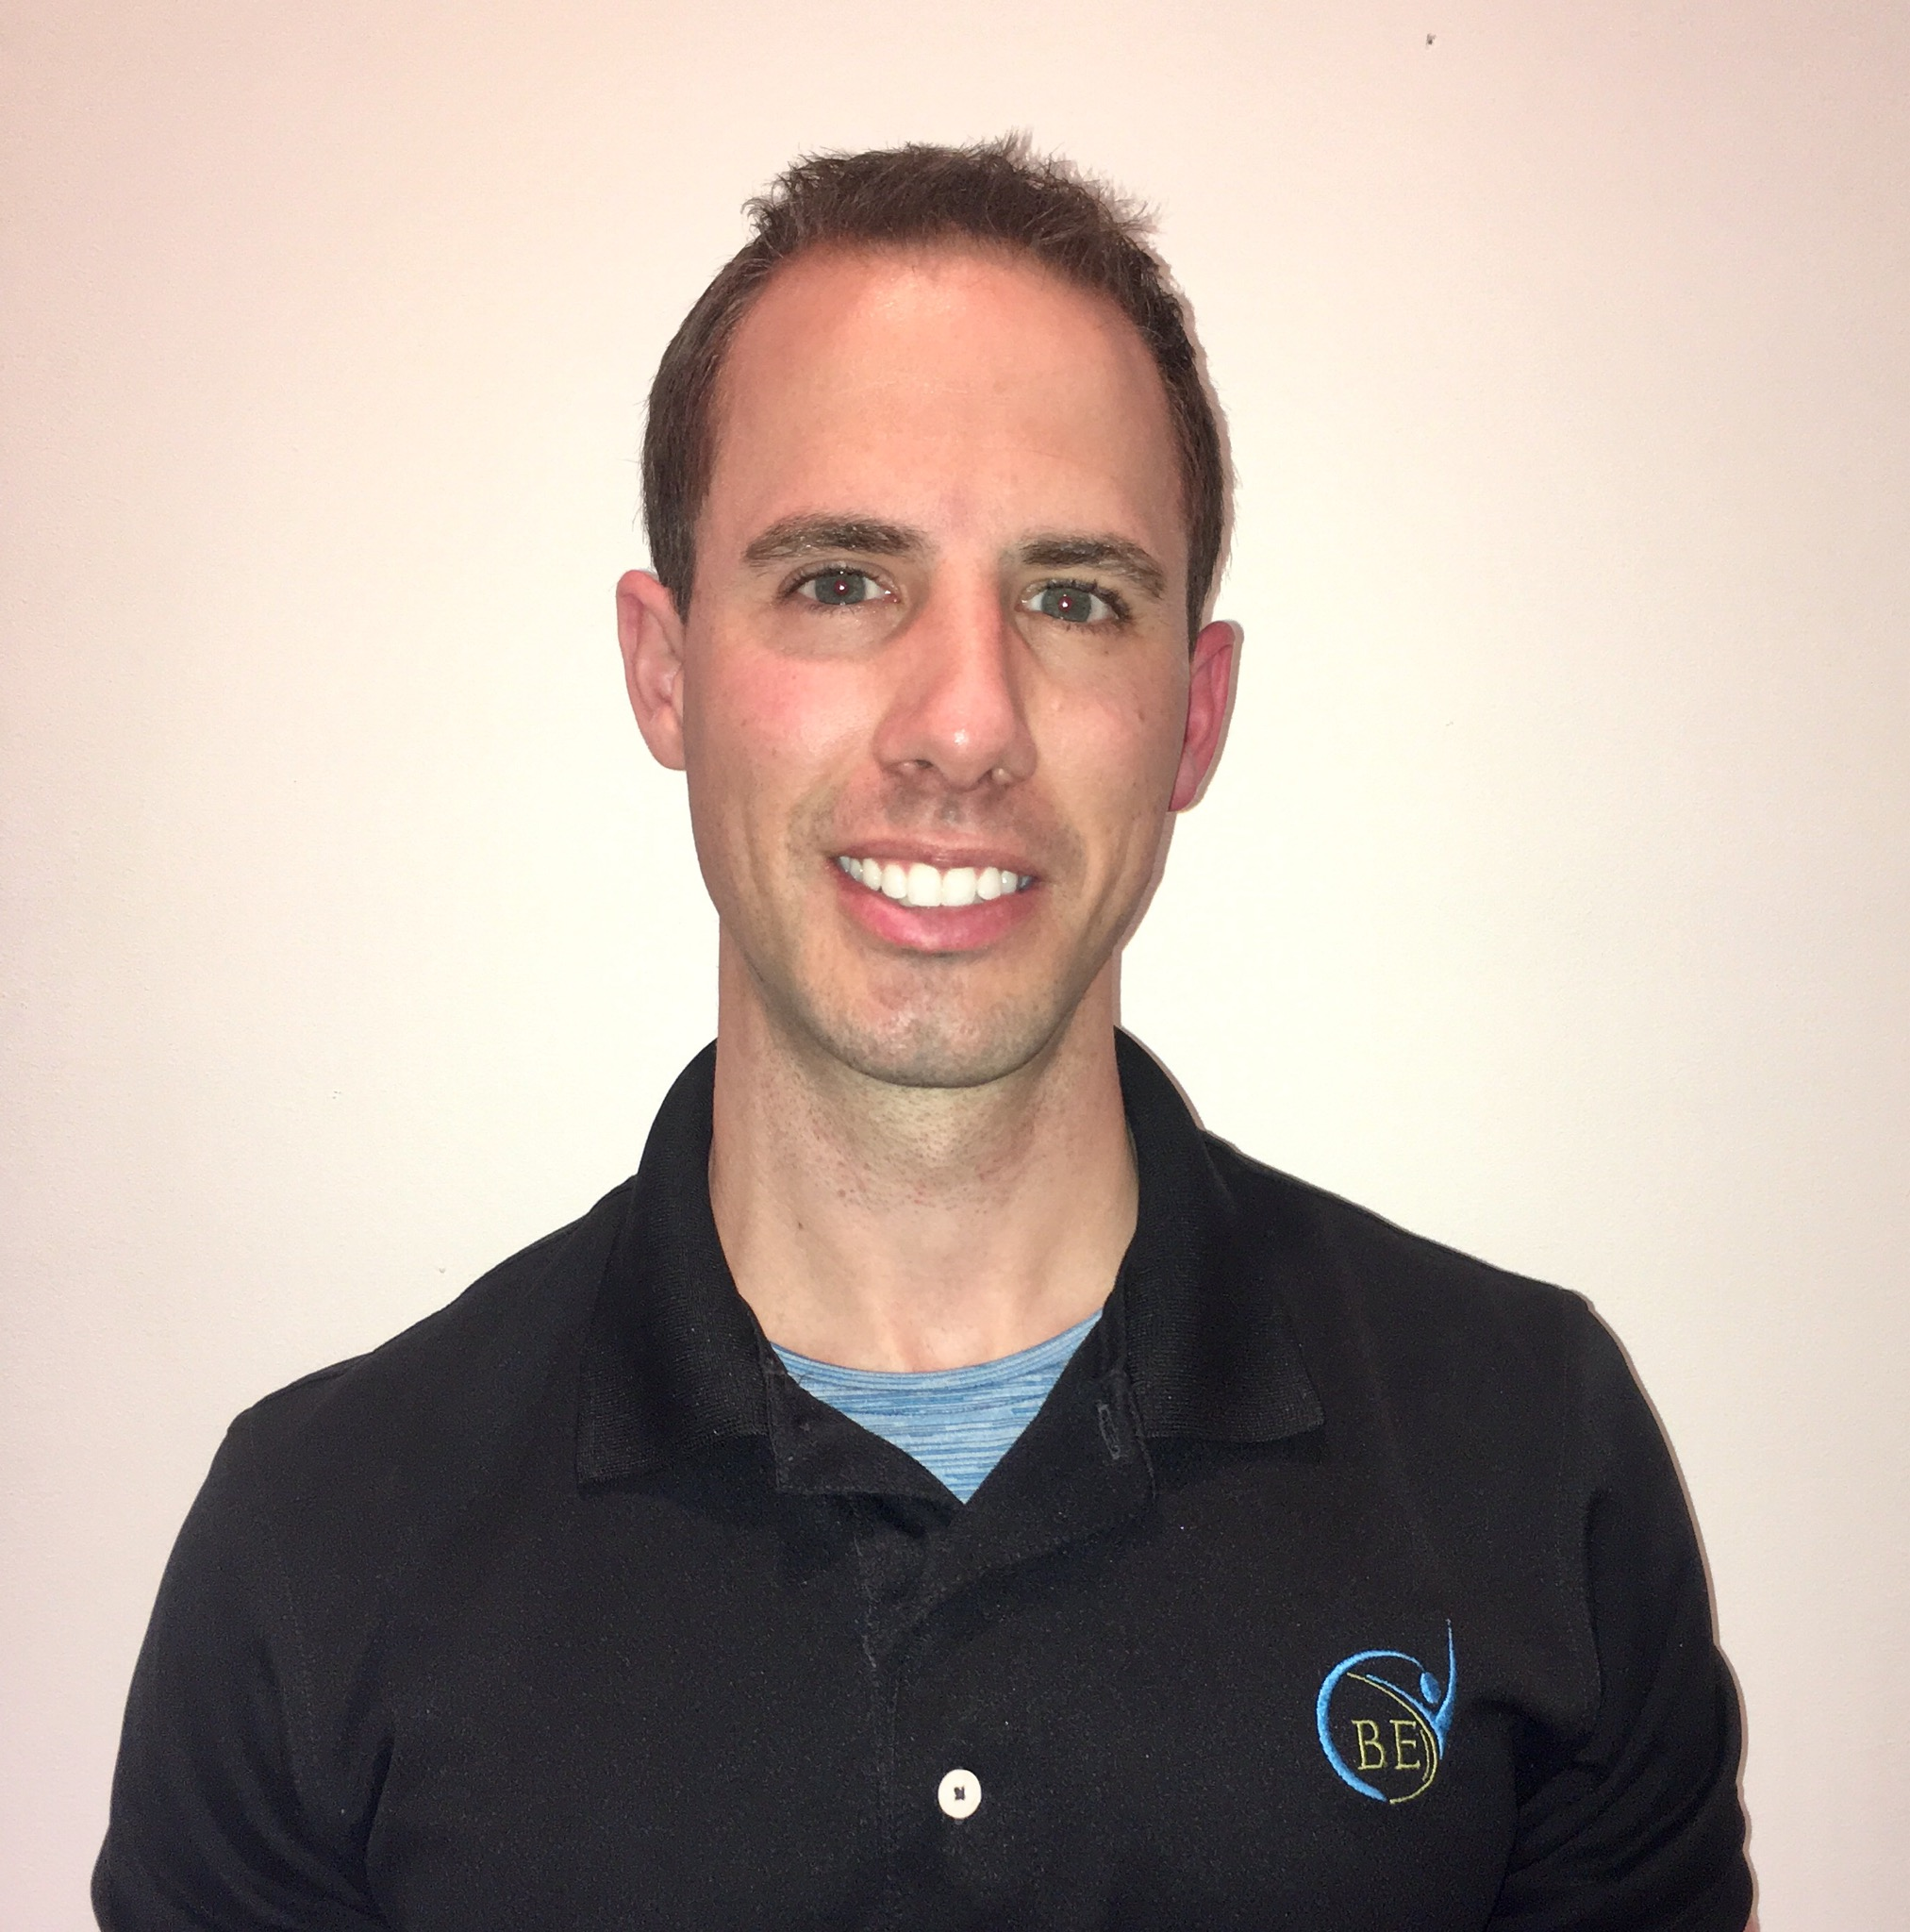 Mark Radio, Body Elite General Manager